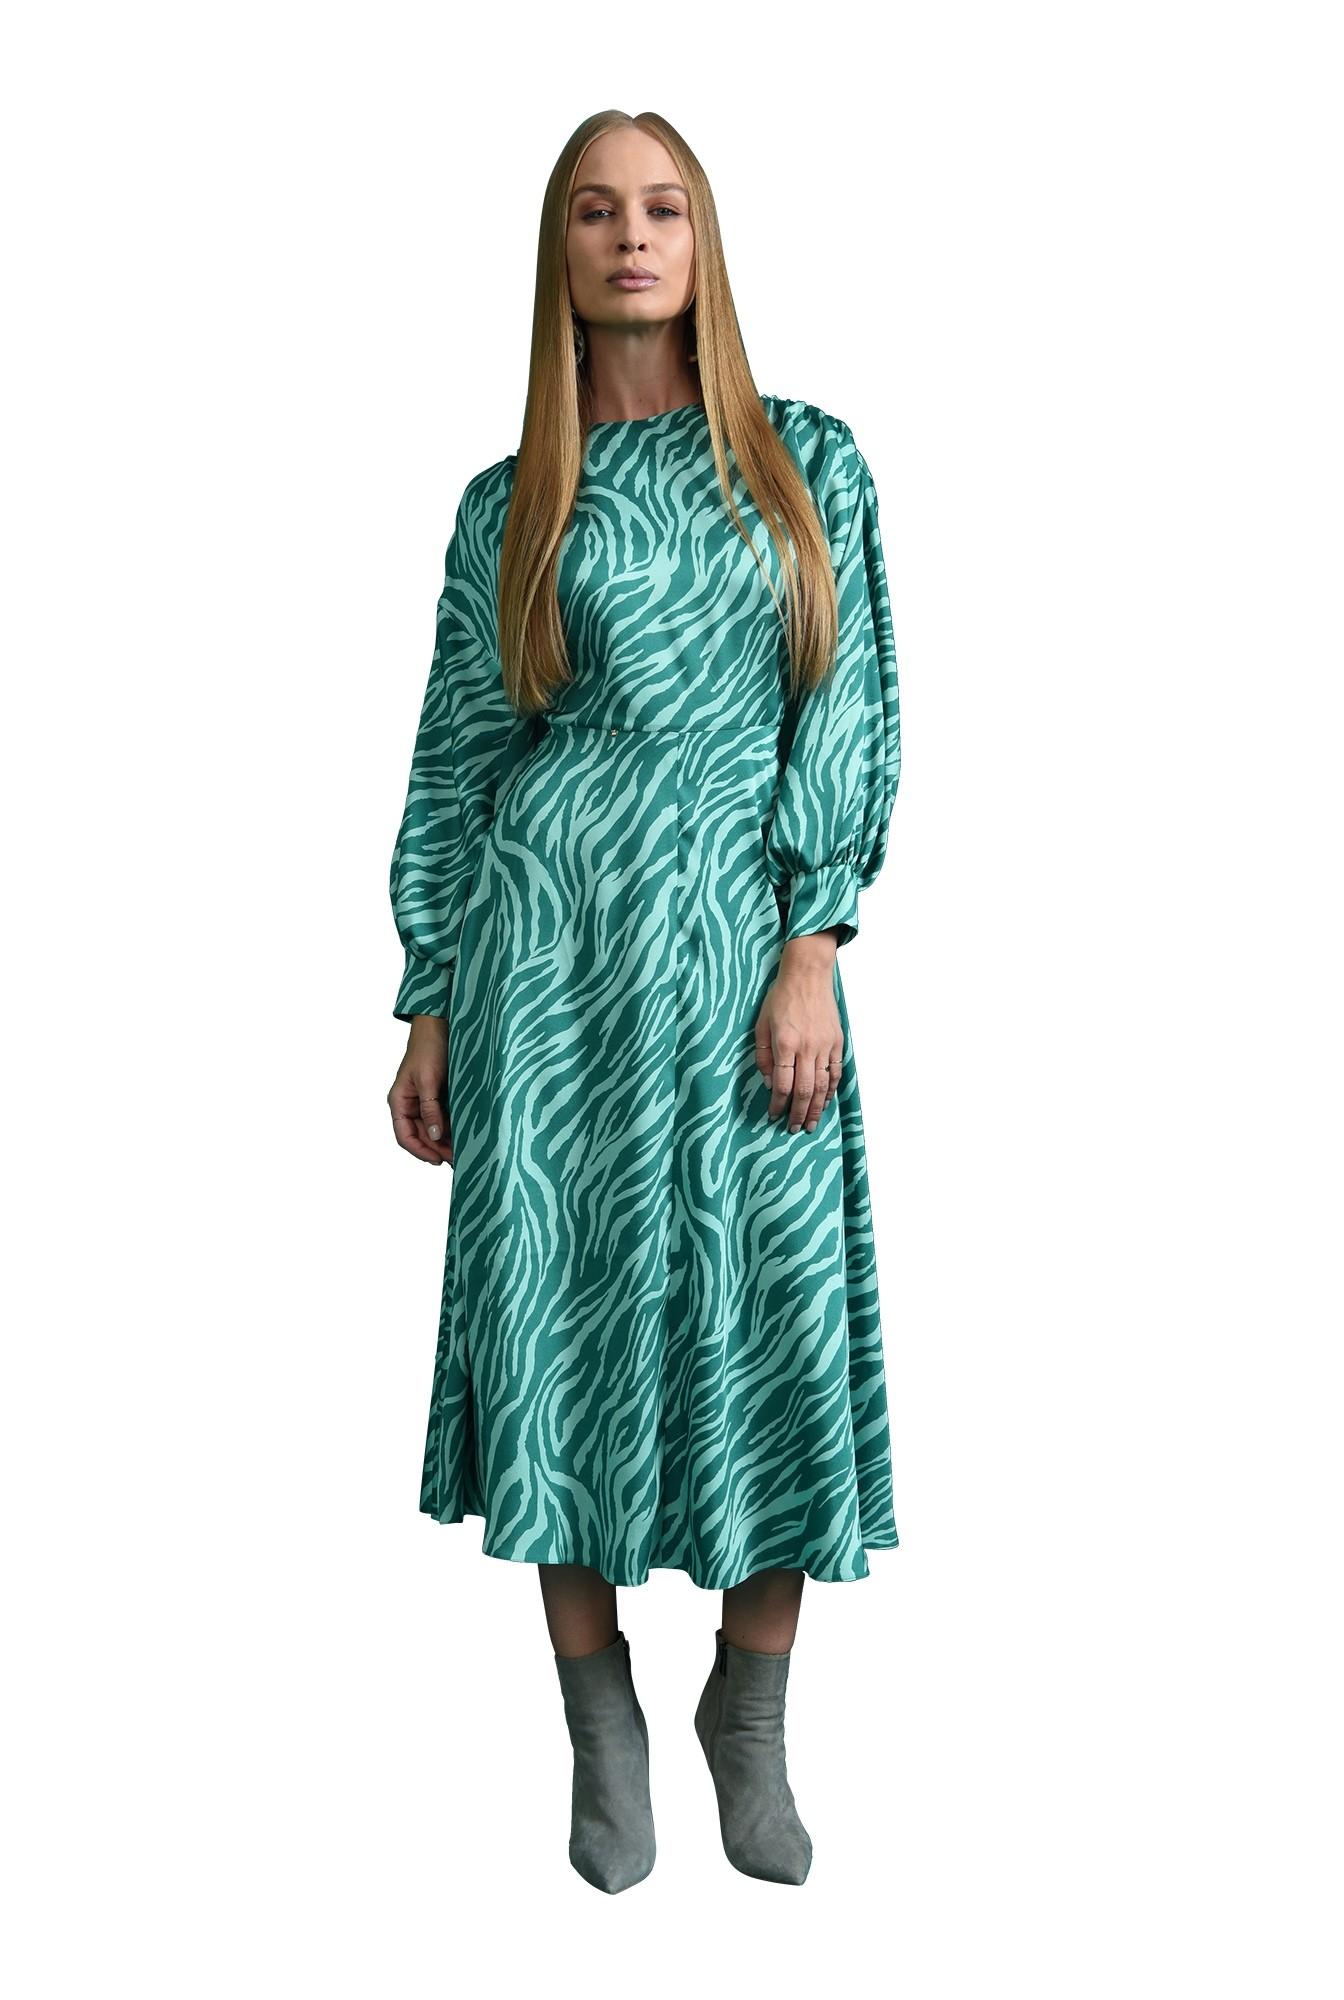 3 - rochie midi, evazata, cu detaliu la umarul cazut